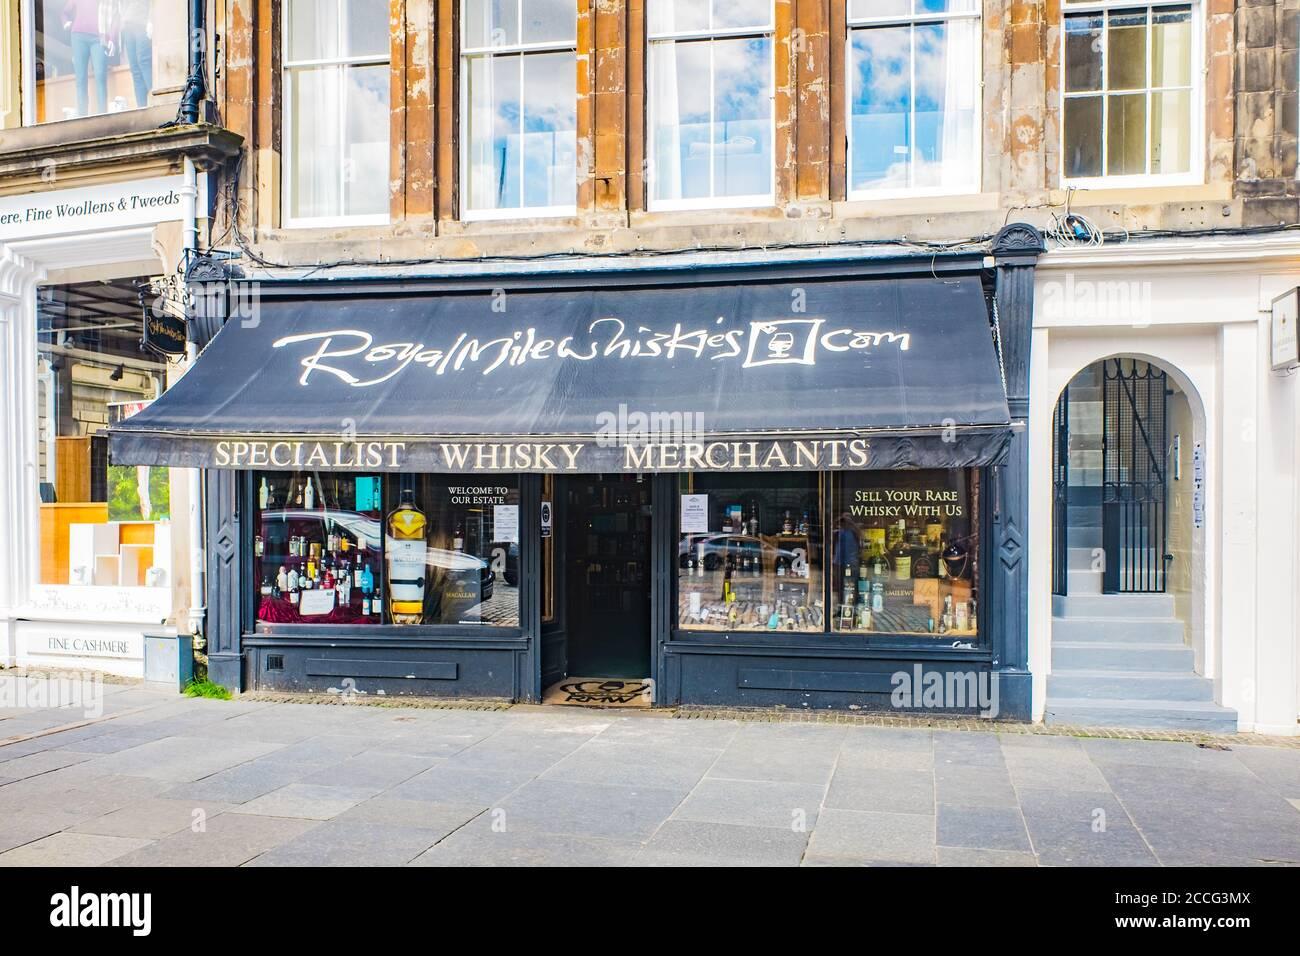 Edinburgh Scotland 6th aug 2020 whisky shop facade on Cannongate, Royal Mile Stock Photo